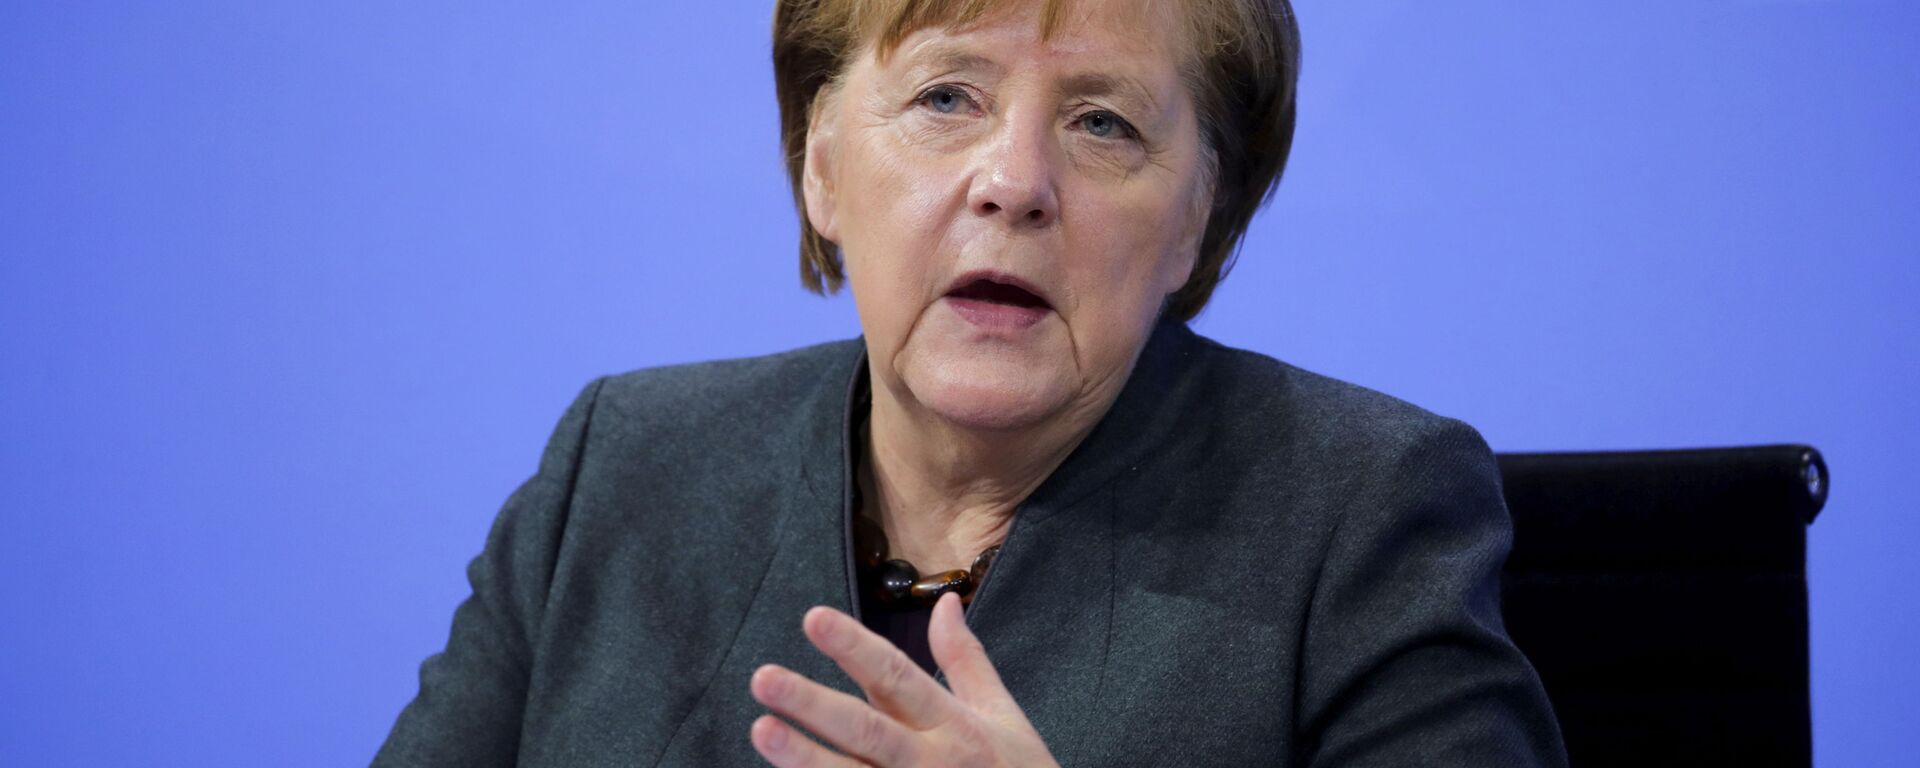 Nemačka kancelarka Angela Merkel - Sputnik Srbija, 1920, 12.09.2021